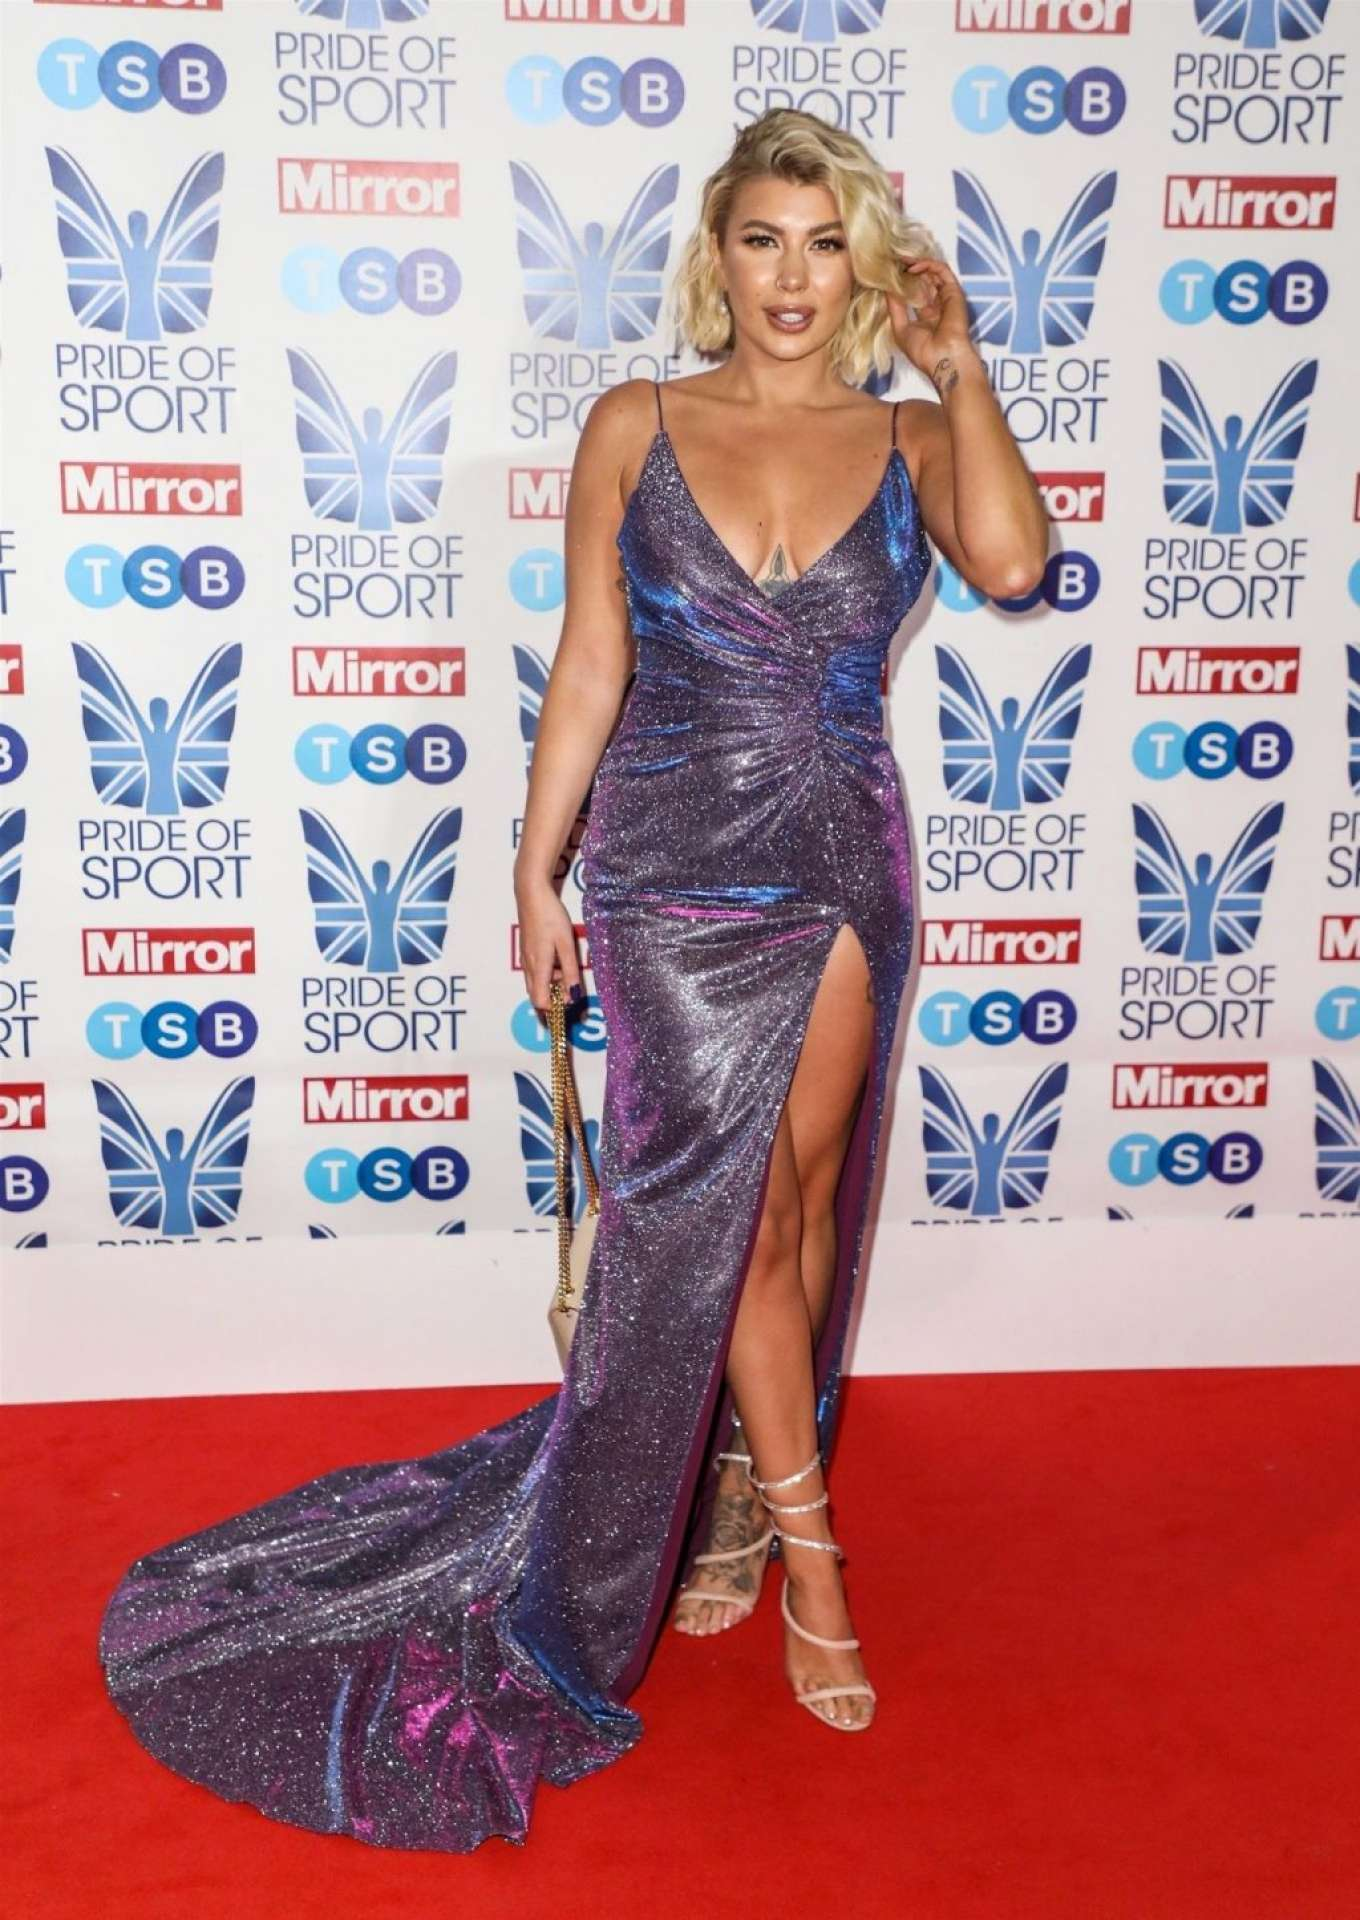 Olivia Buckland 2019 : Olivia Buckland – 2019 Daily Mirror Pride of Sport Awards-39